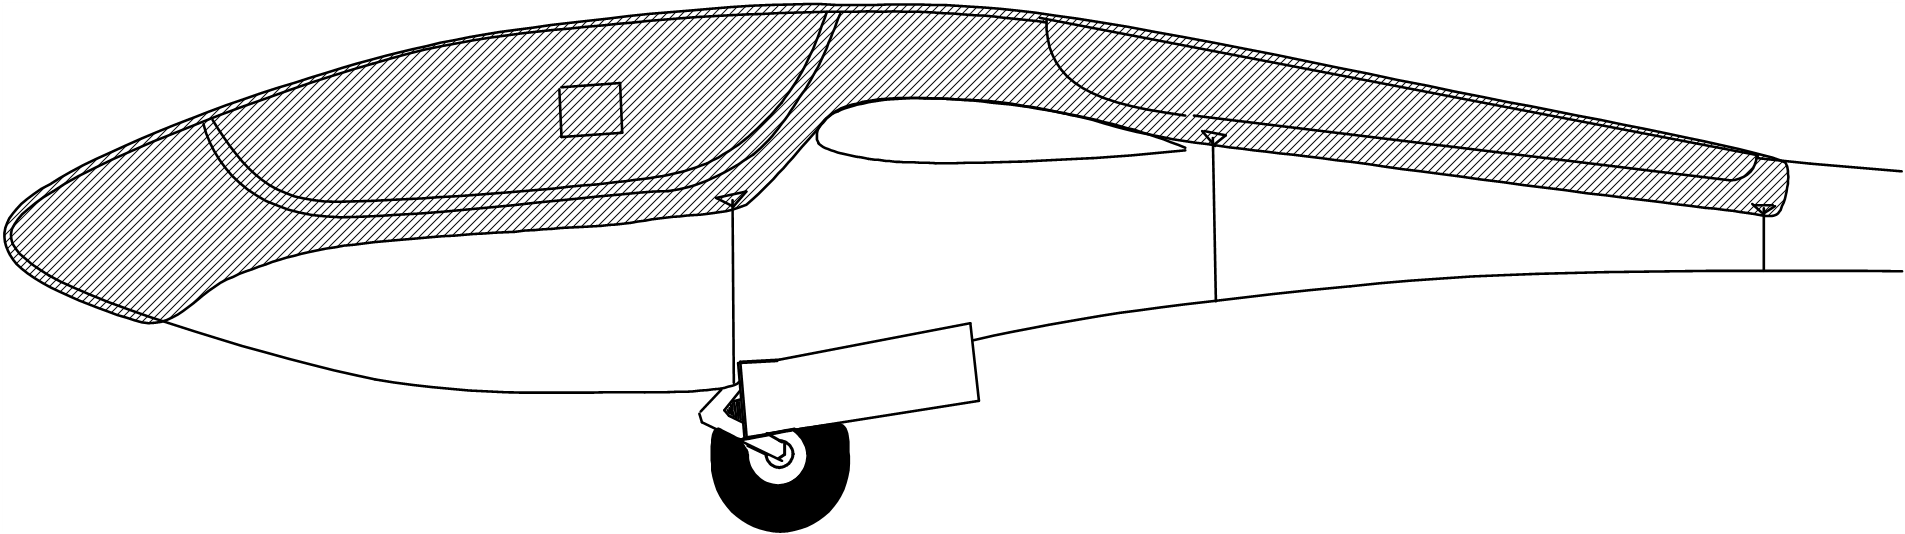 Haubenbezug Doppelsitzer Stoff Seersucker AIR BASIC Long